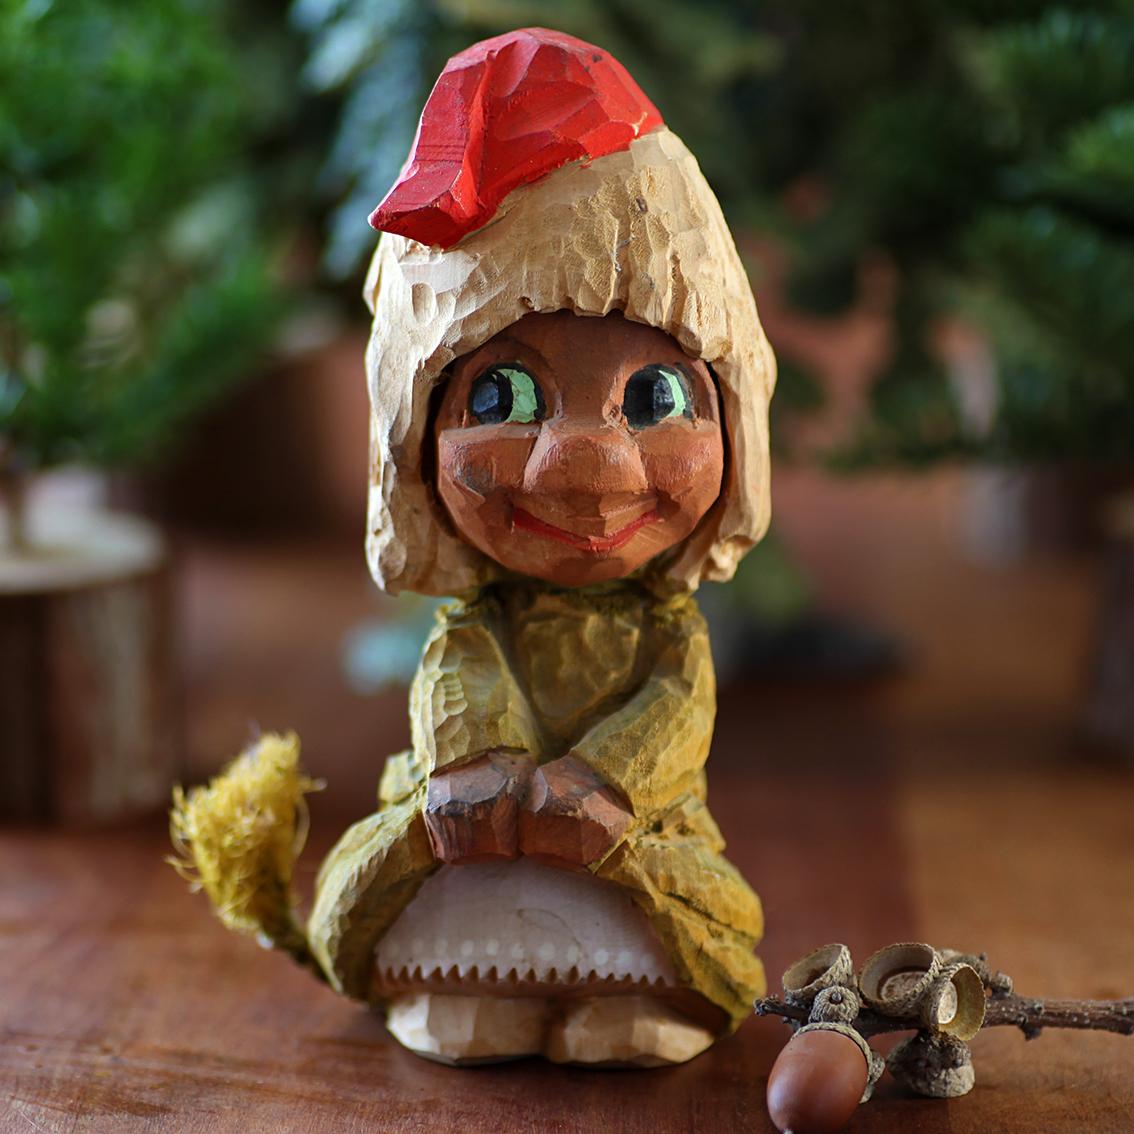 Henning ヘニング Troll トロール 木彫り人形-5 北欧ヴィンテージ